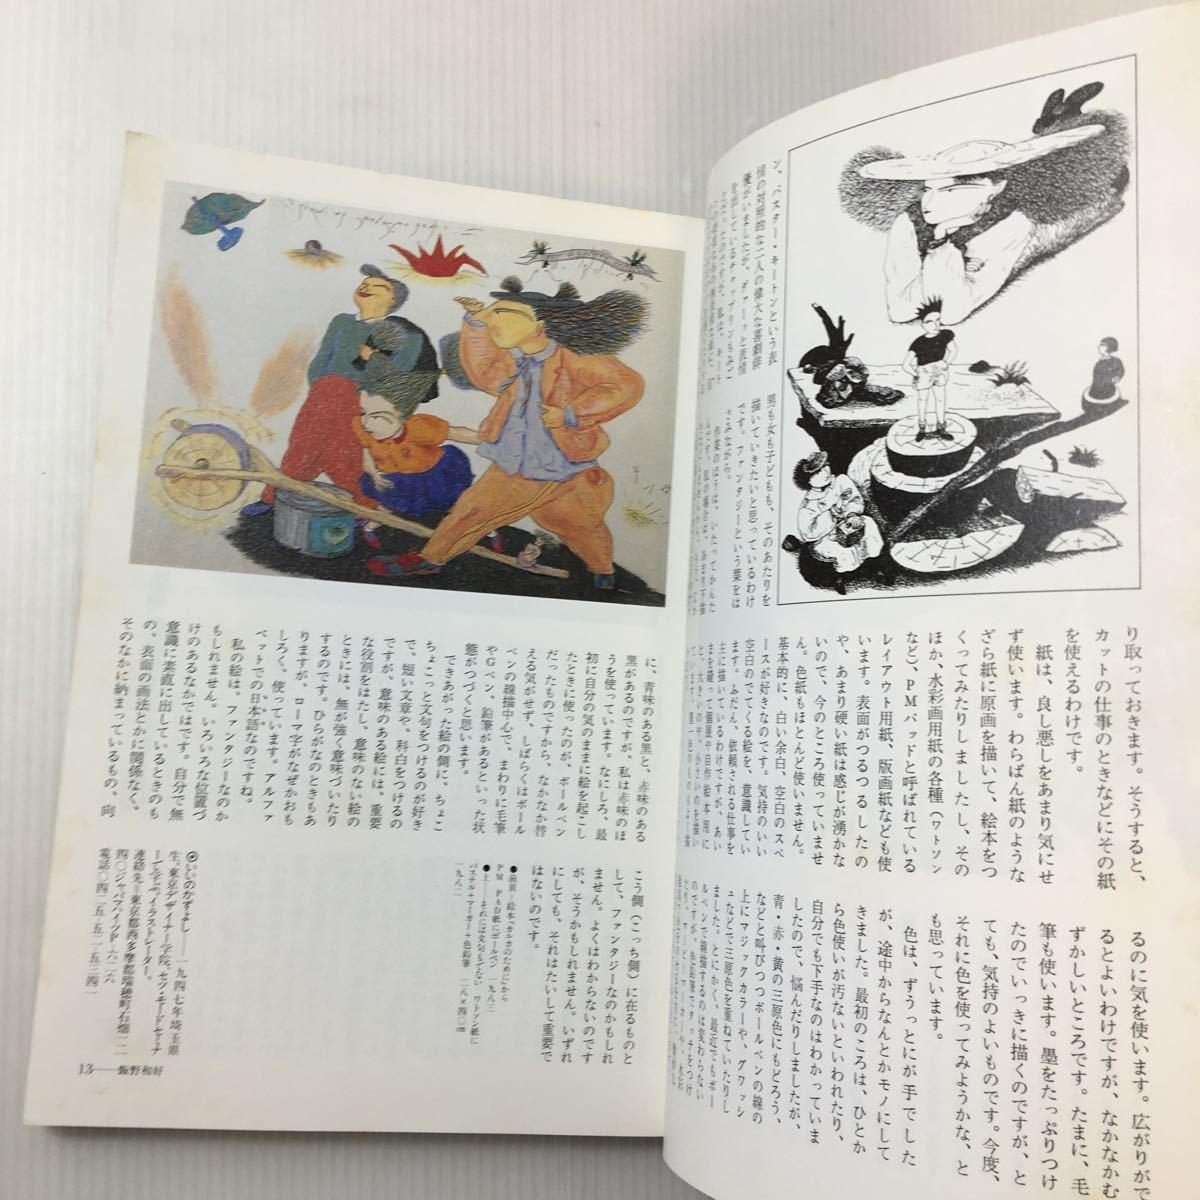 zaa-050♪別冊 美術手帖 デザインの現場から BT美術手帖 1983年3月号 Vol.2 No.4 spring_画像4